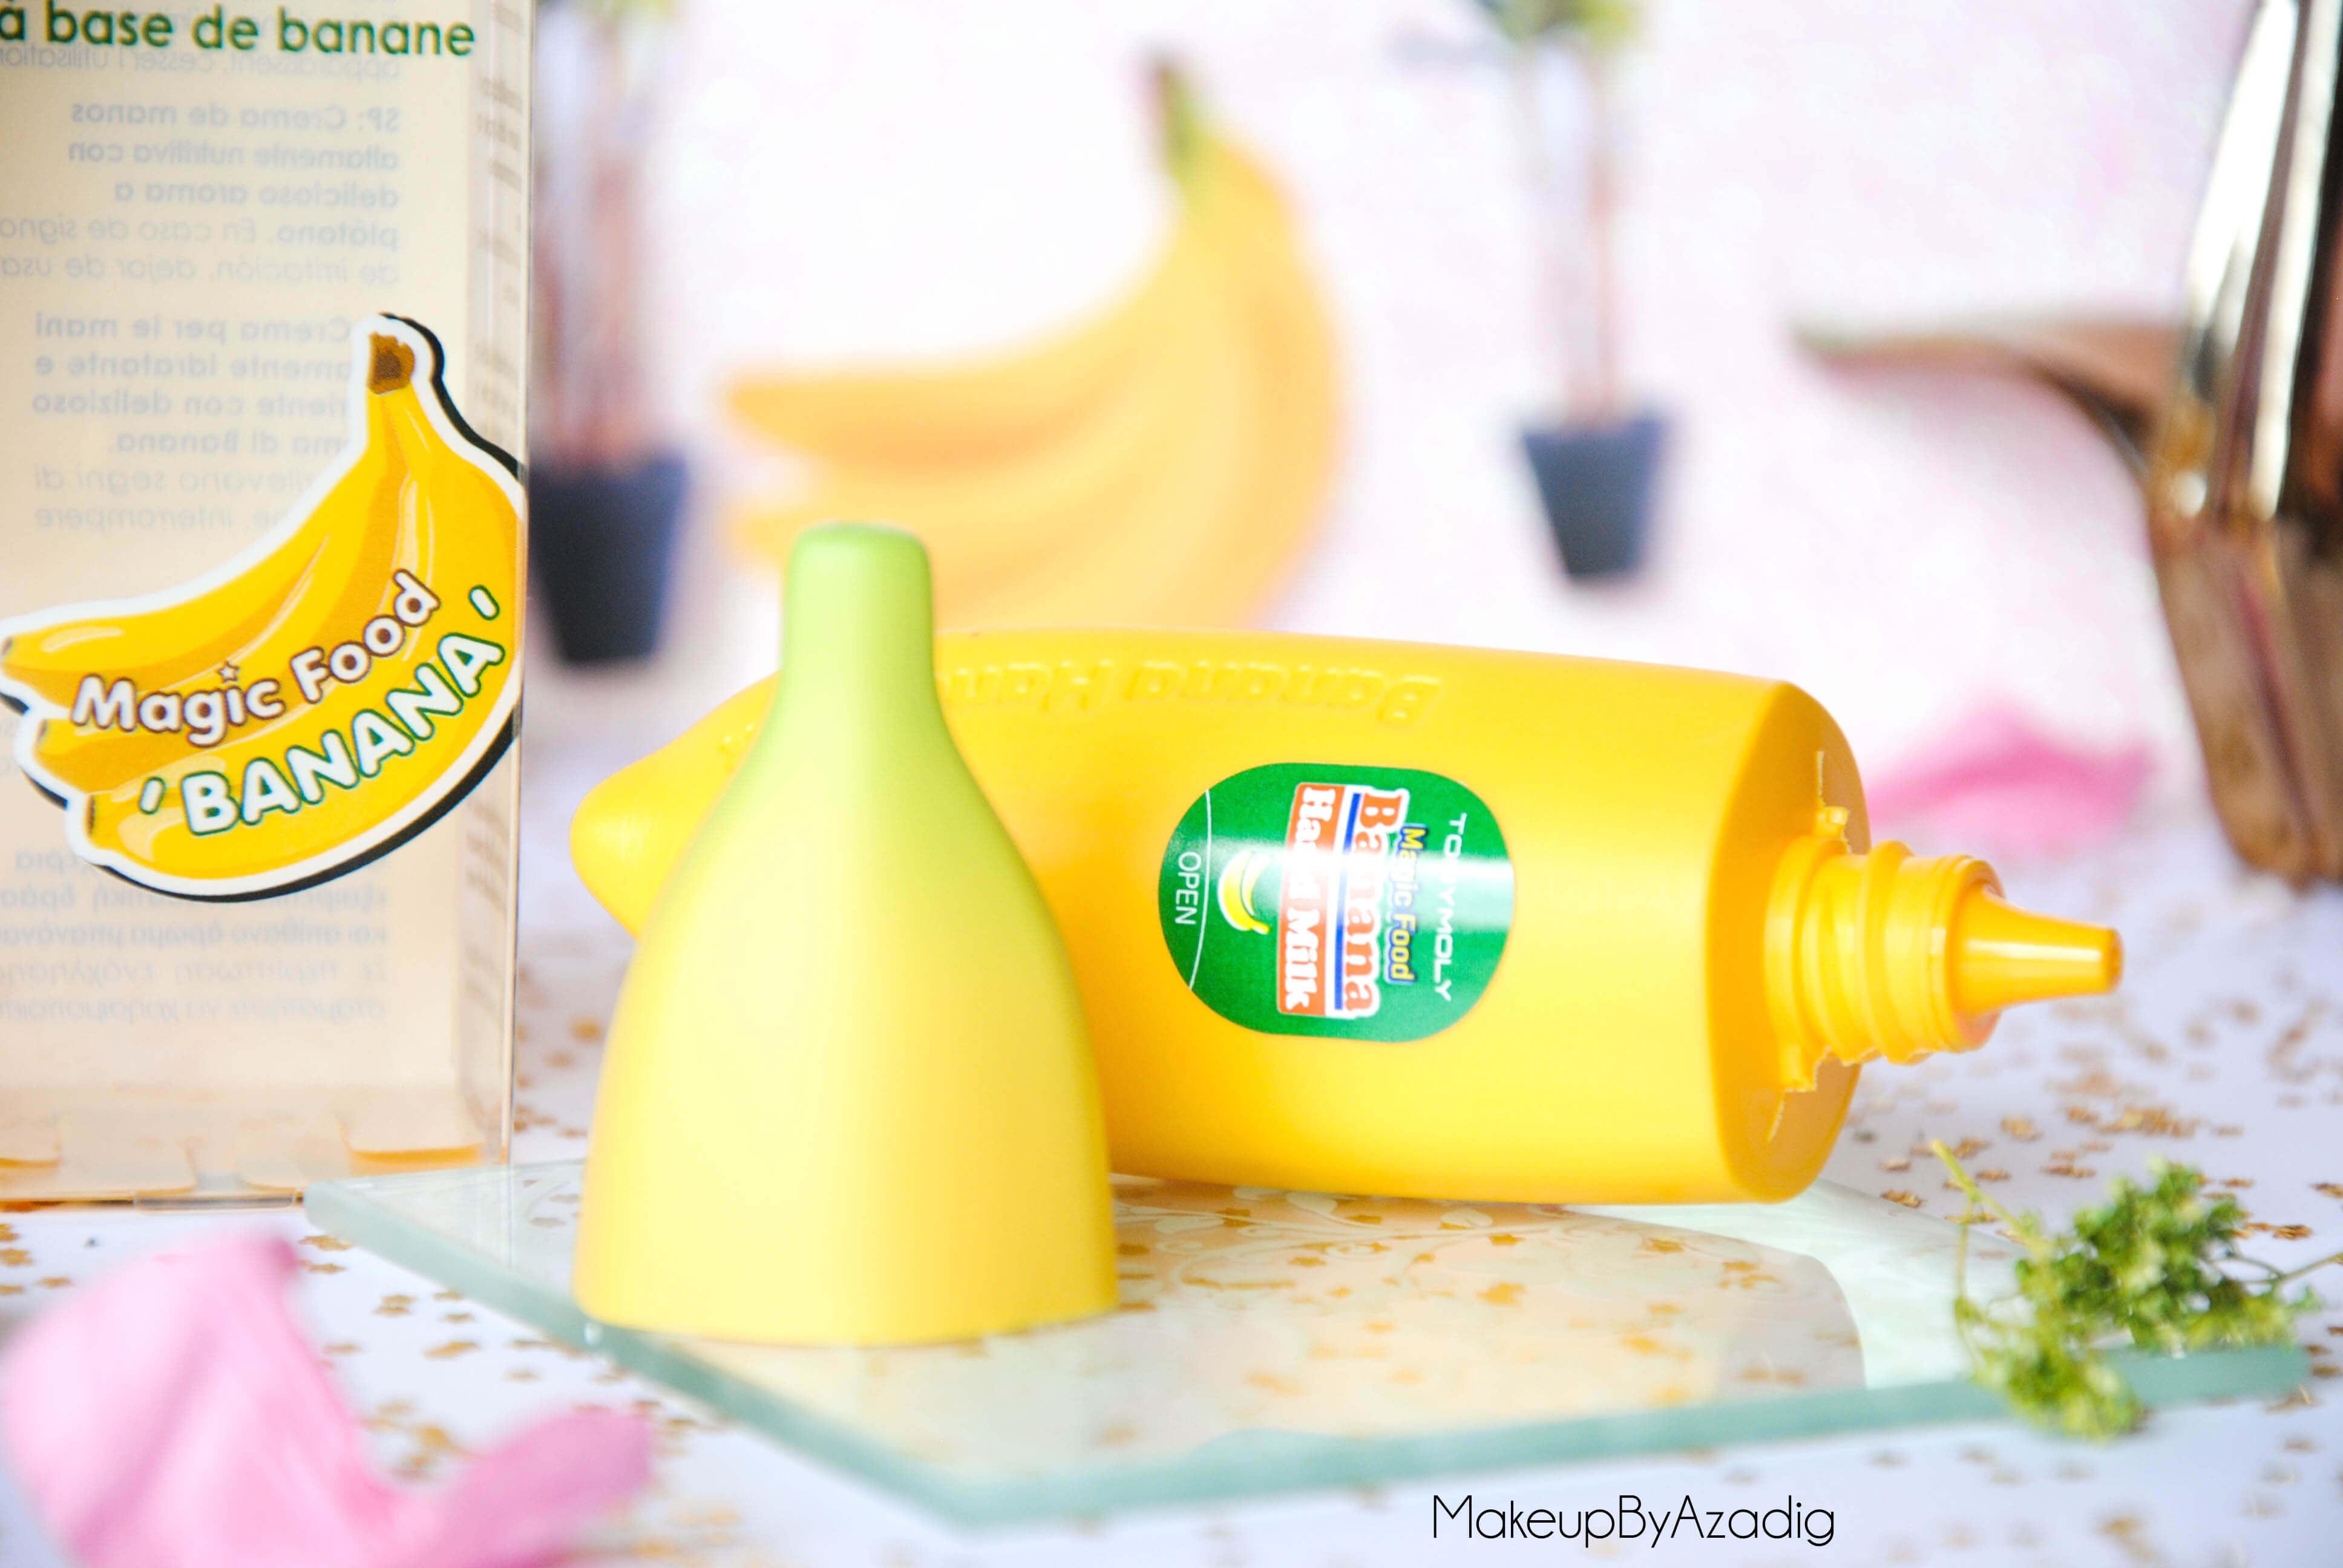 magic-food-banana-hand-milk-tonymoly-banane-creme-main-hand-cream-review-revue-paris-dijon-troyes-makeupbyazadig-kawai-family